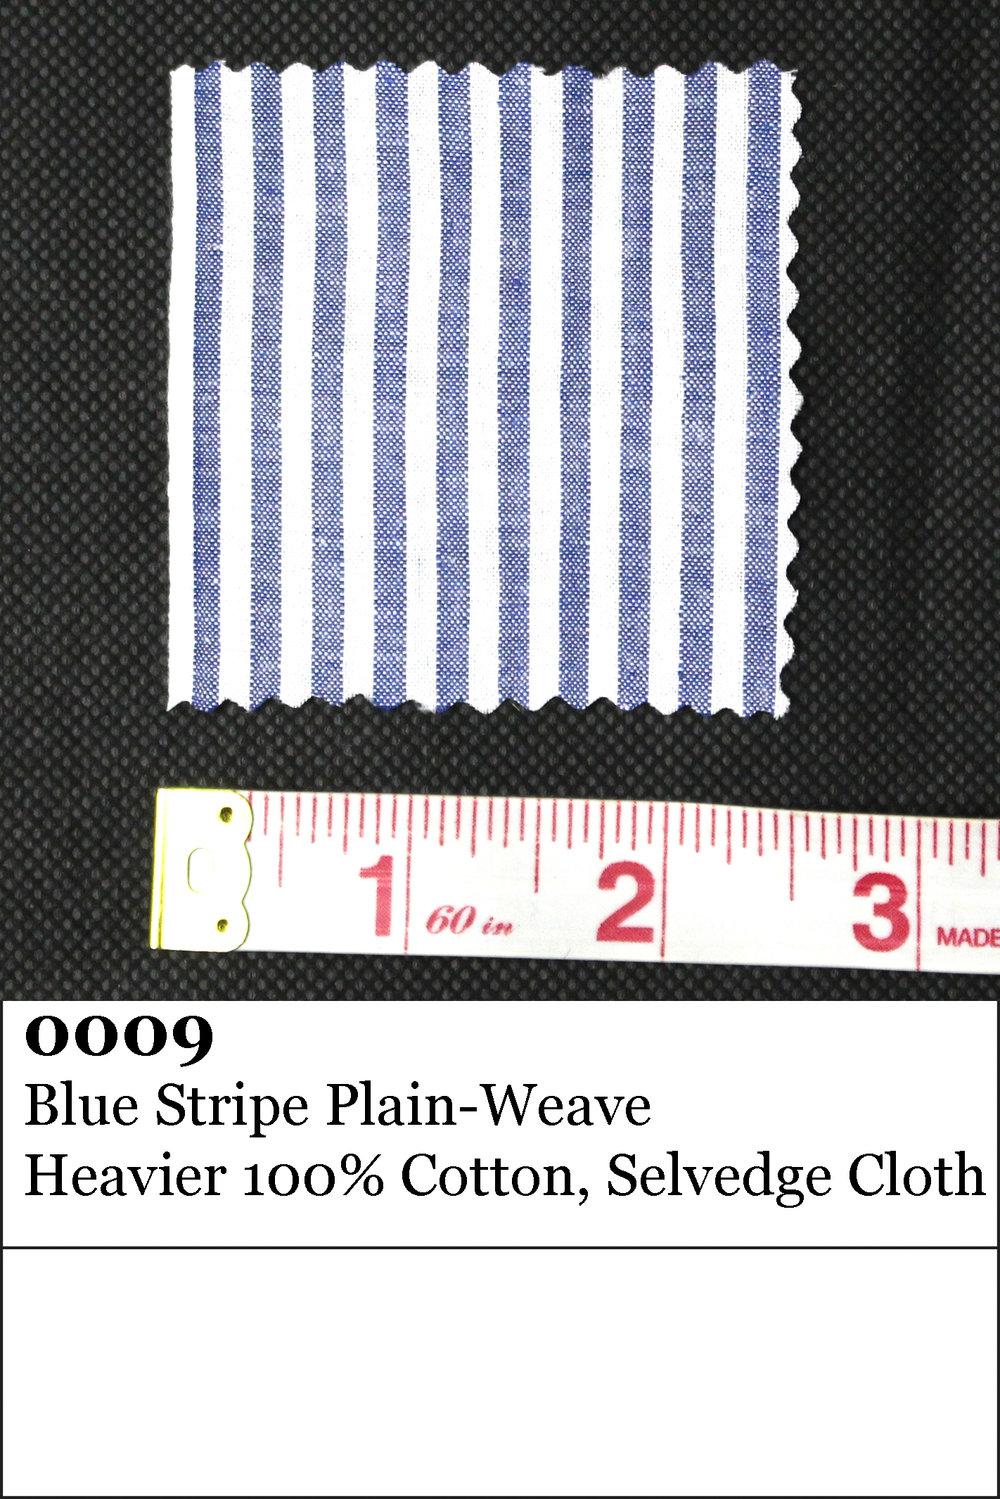 Fabric0009.jpg